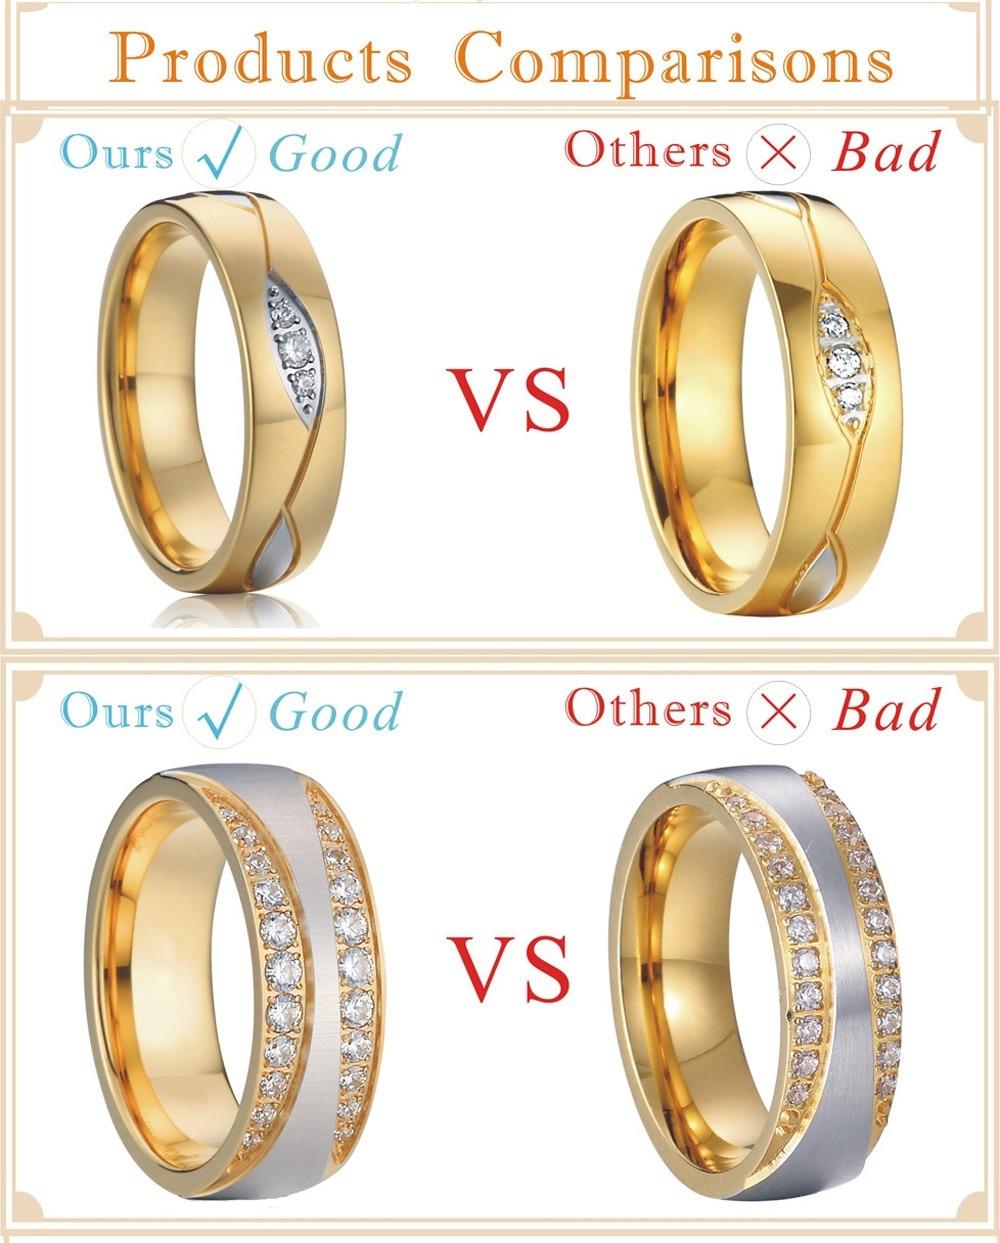 Products comparison 1